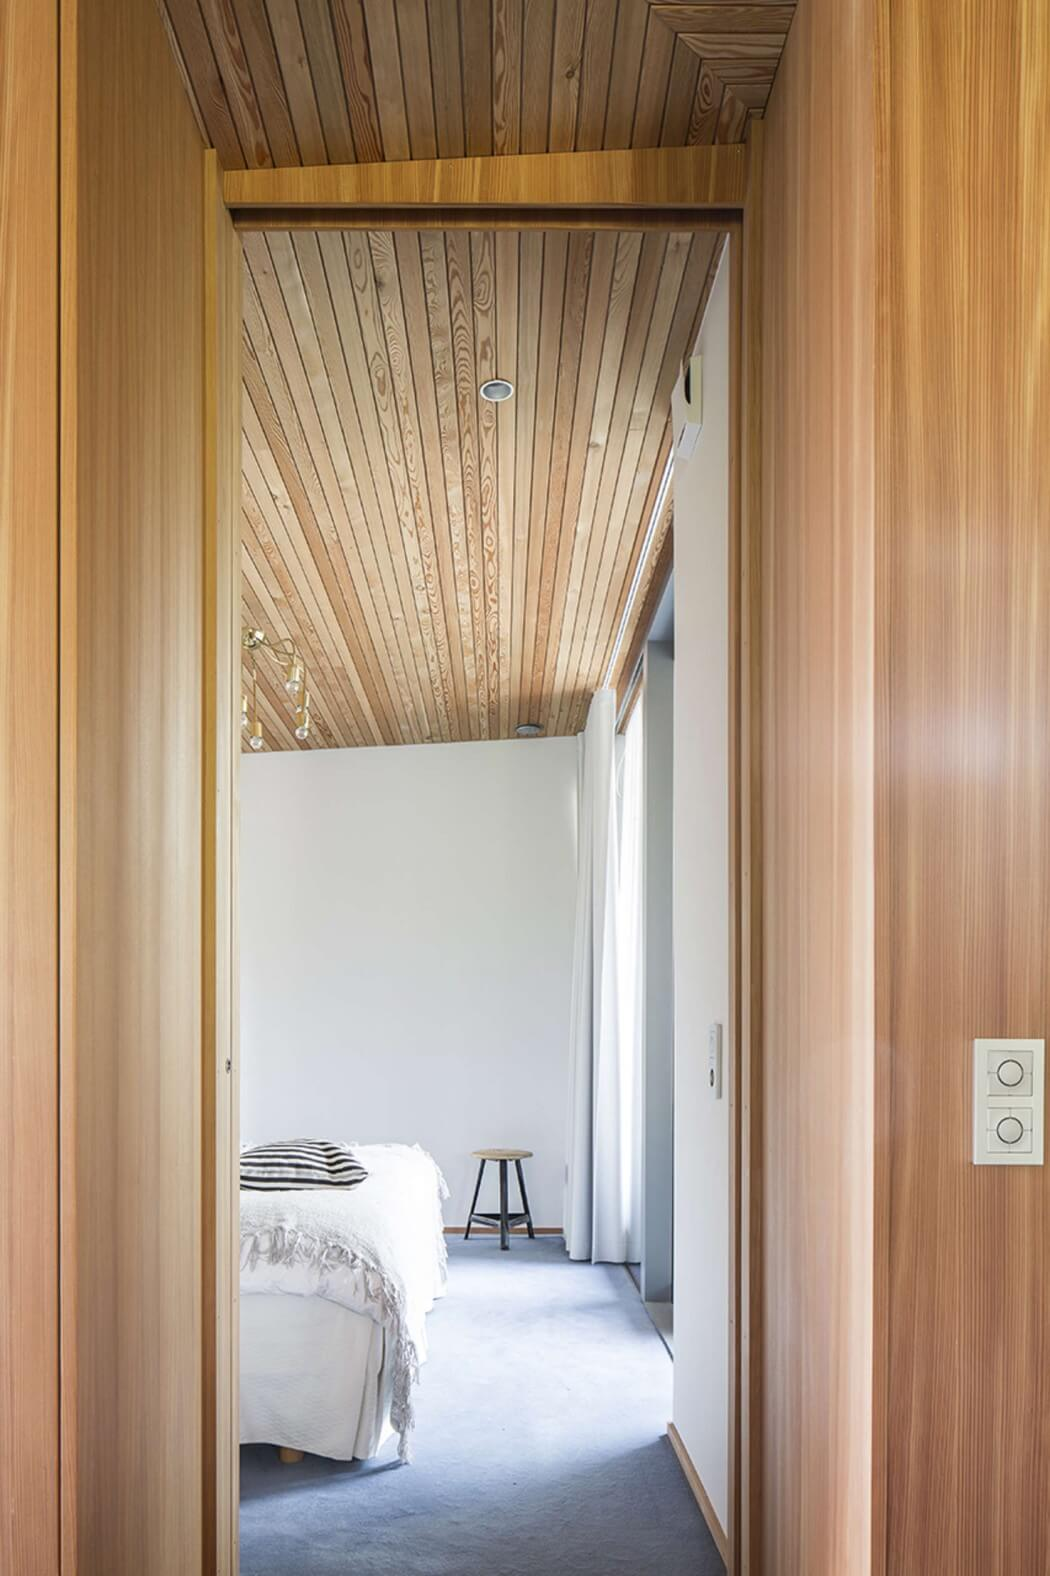 005-villa-ljung-johan-sundberg-arkitektur-1050x1576